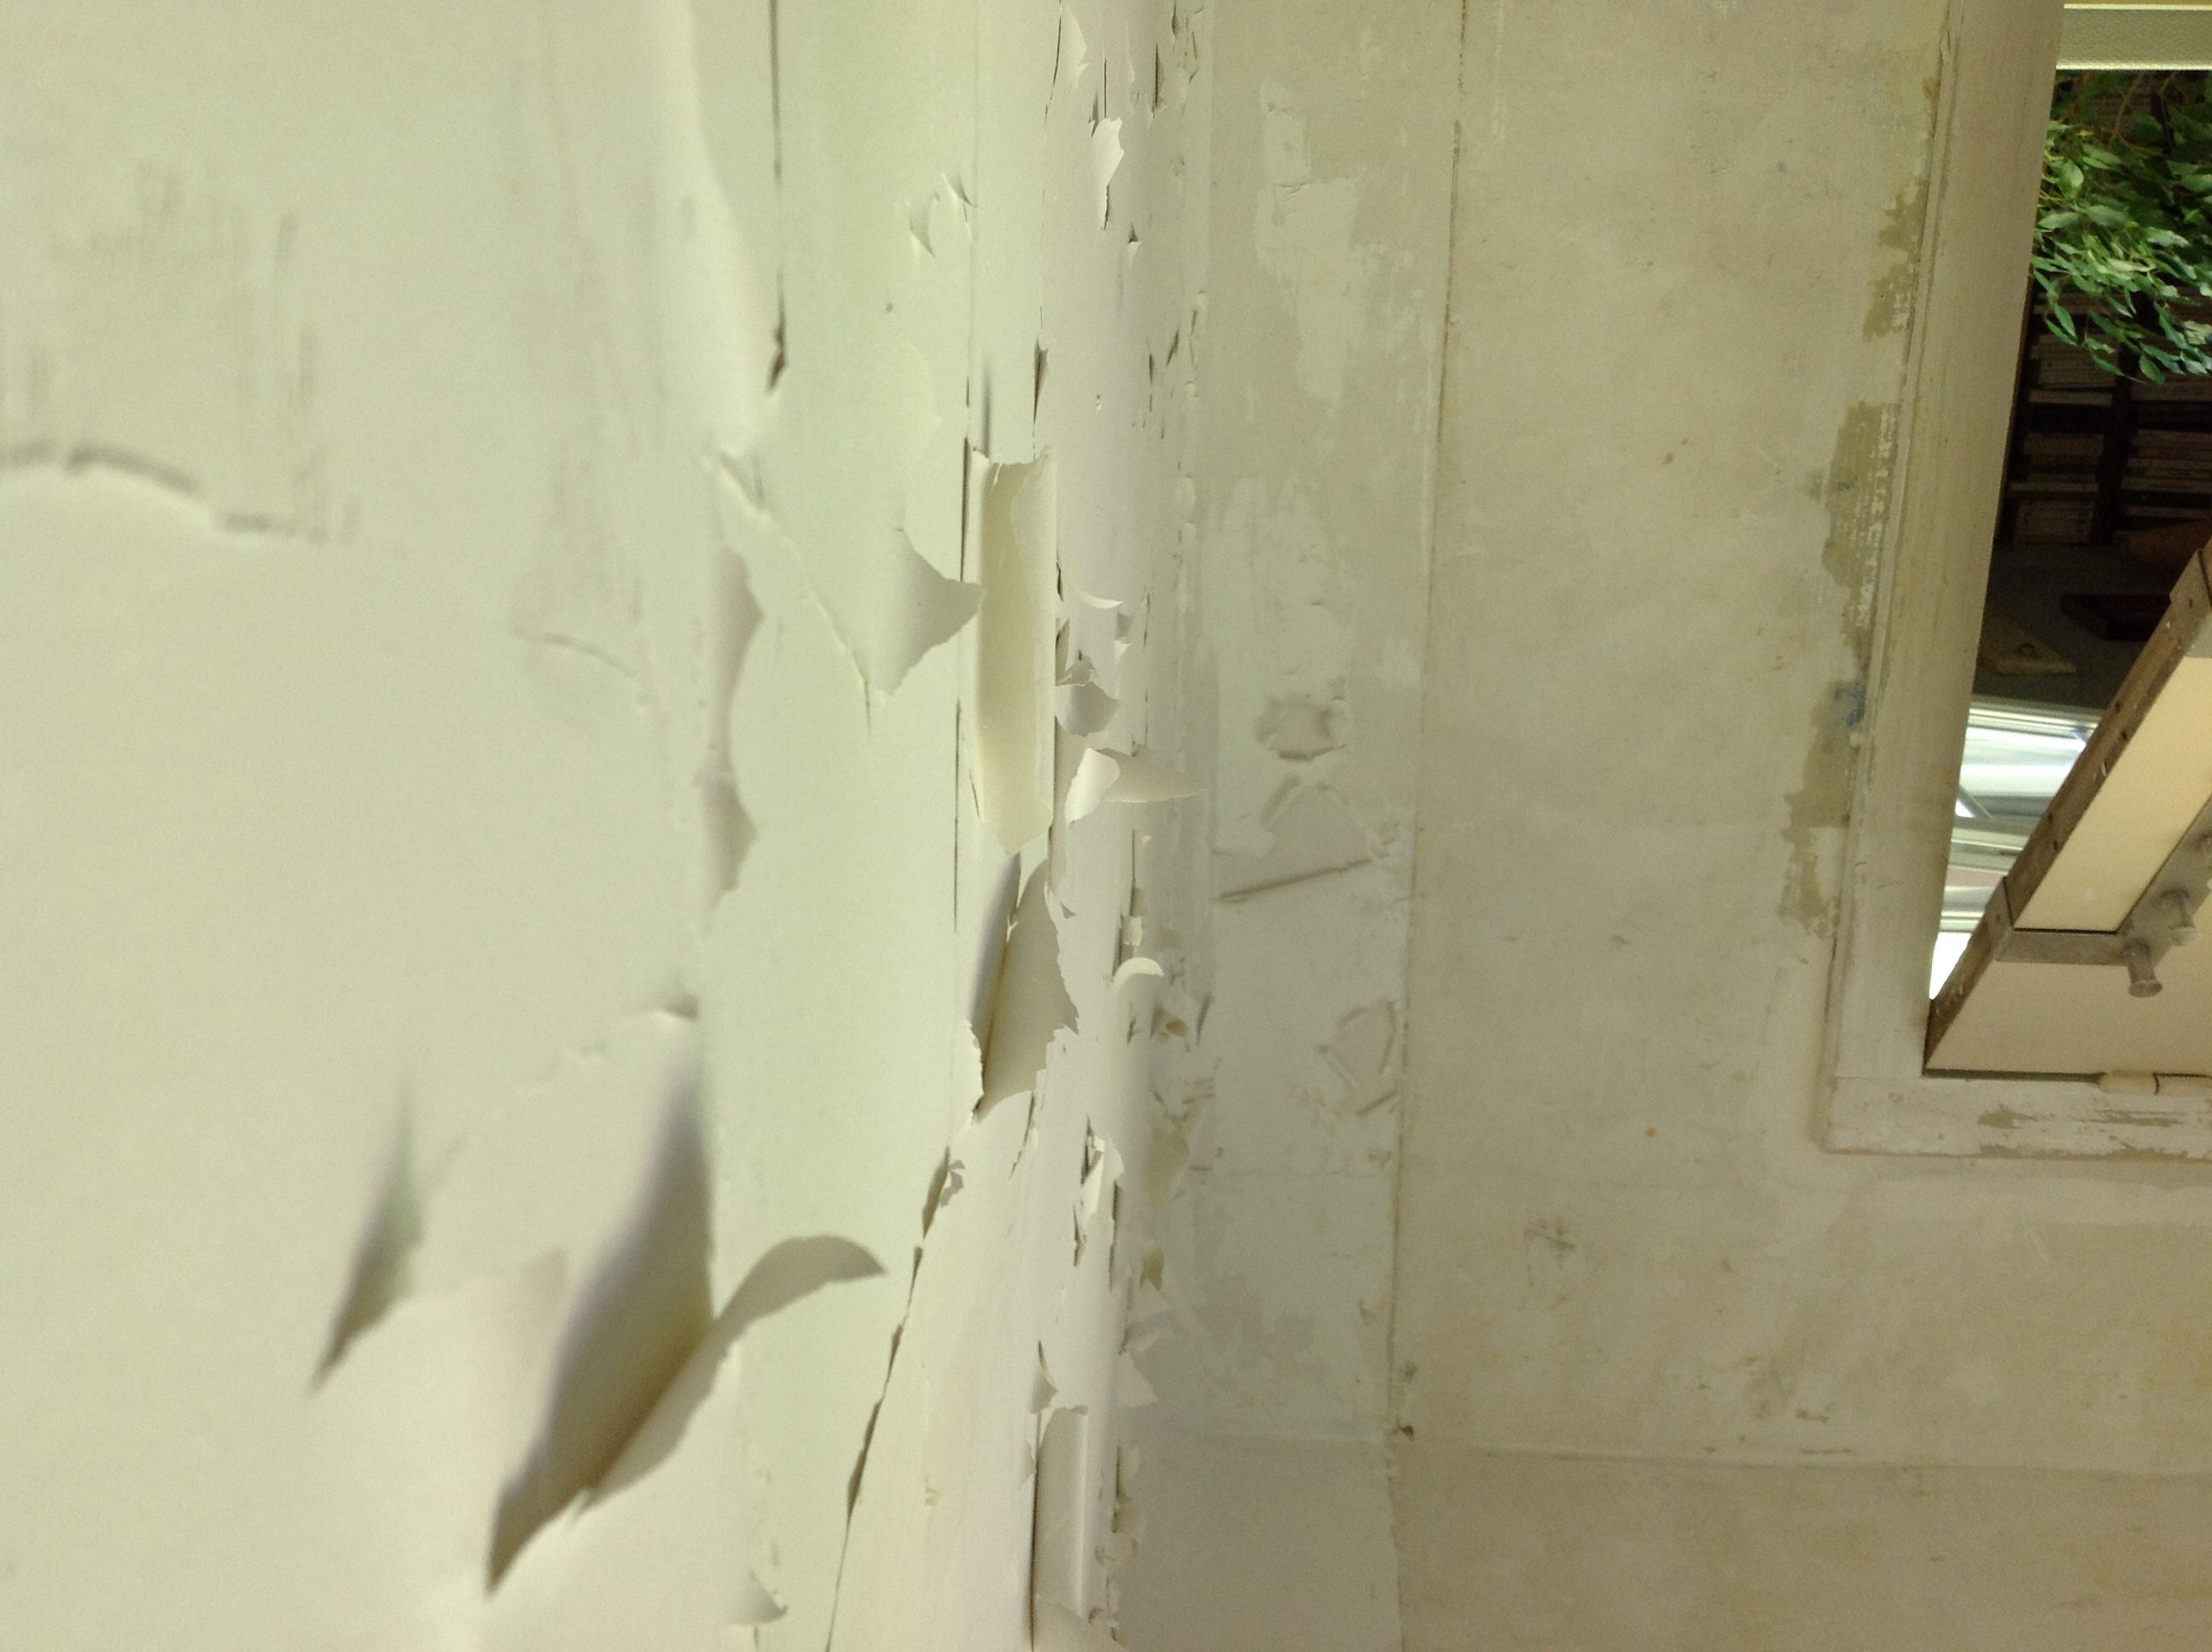 Ancienne Peinture Plafond Qui Gondole Communaute Leroy Merlin